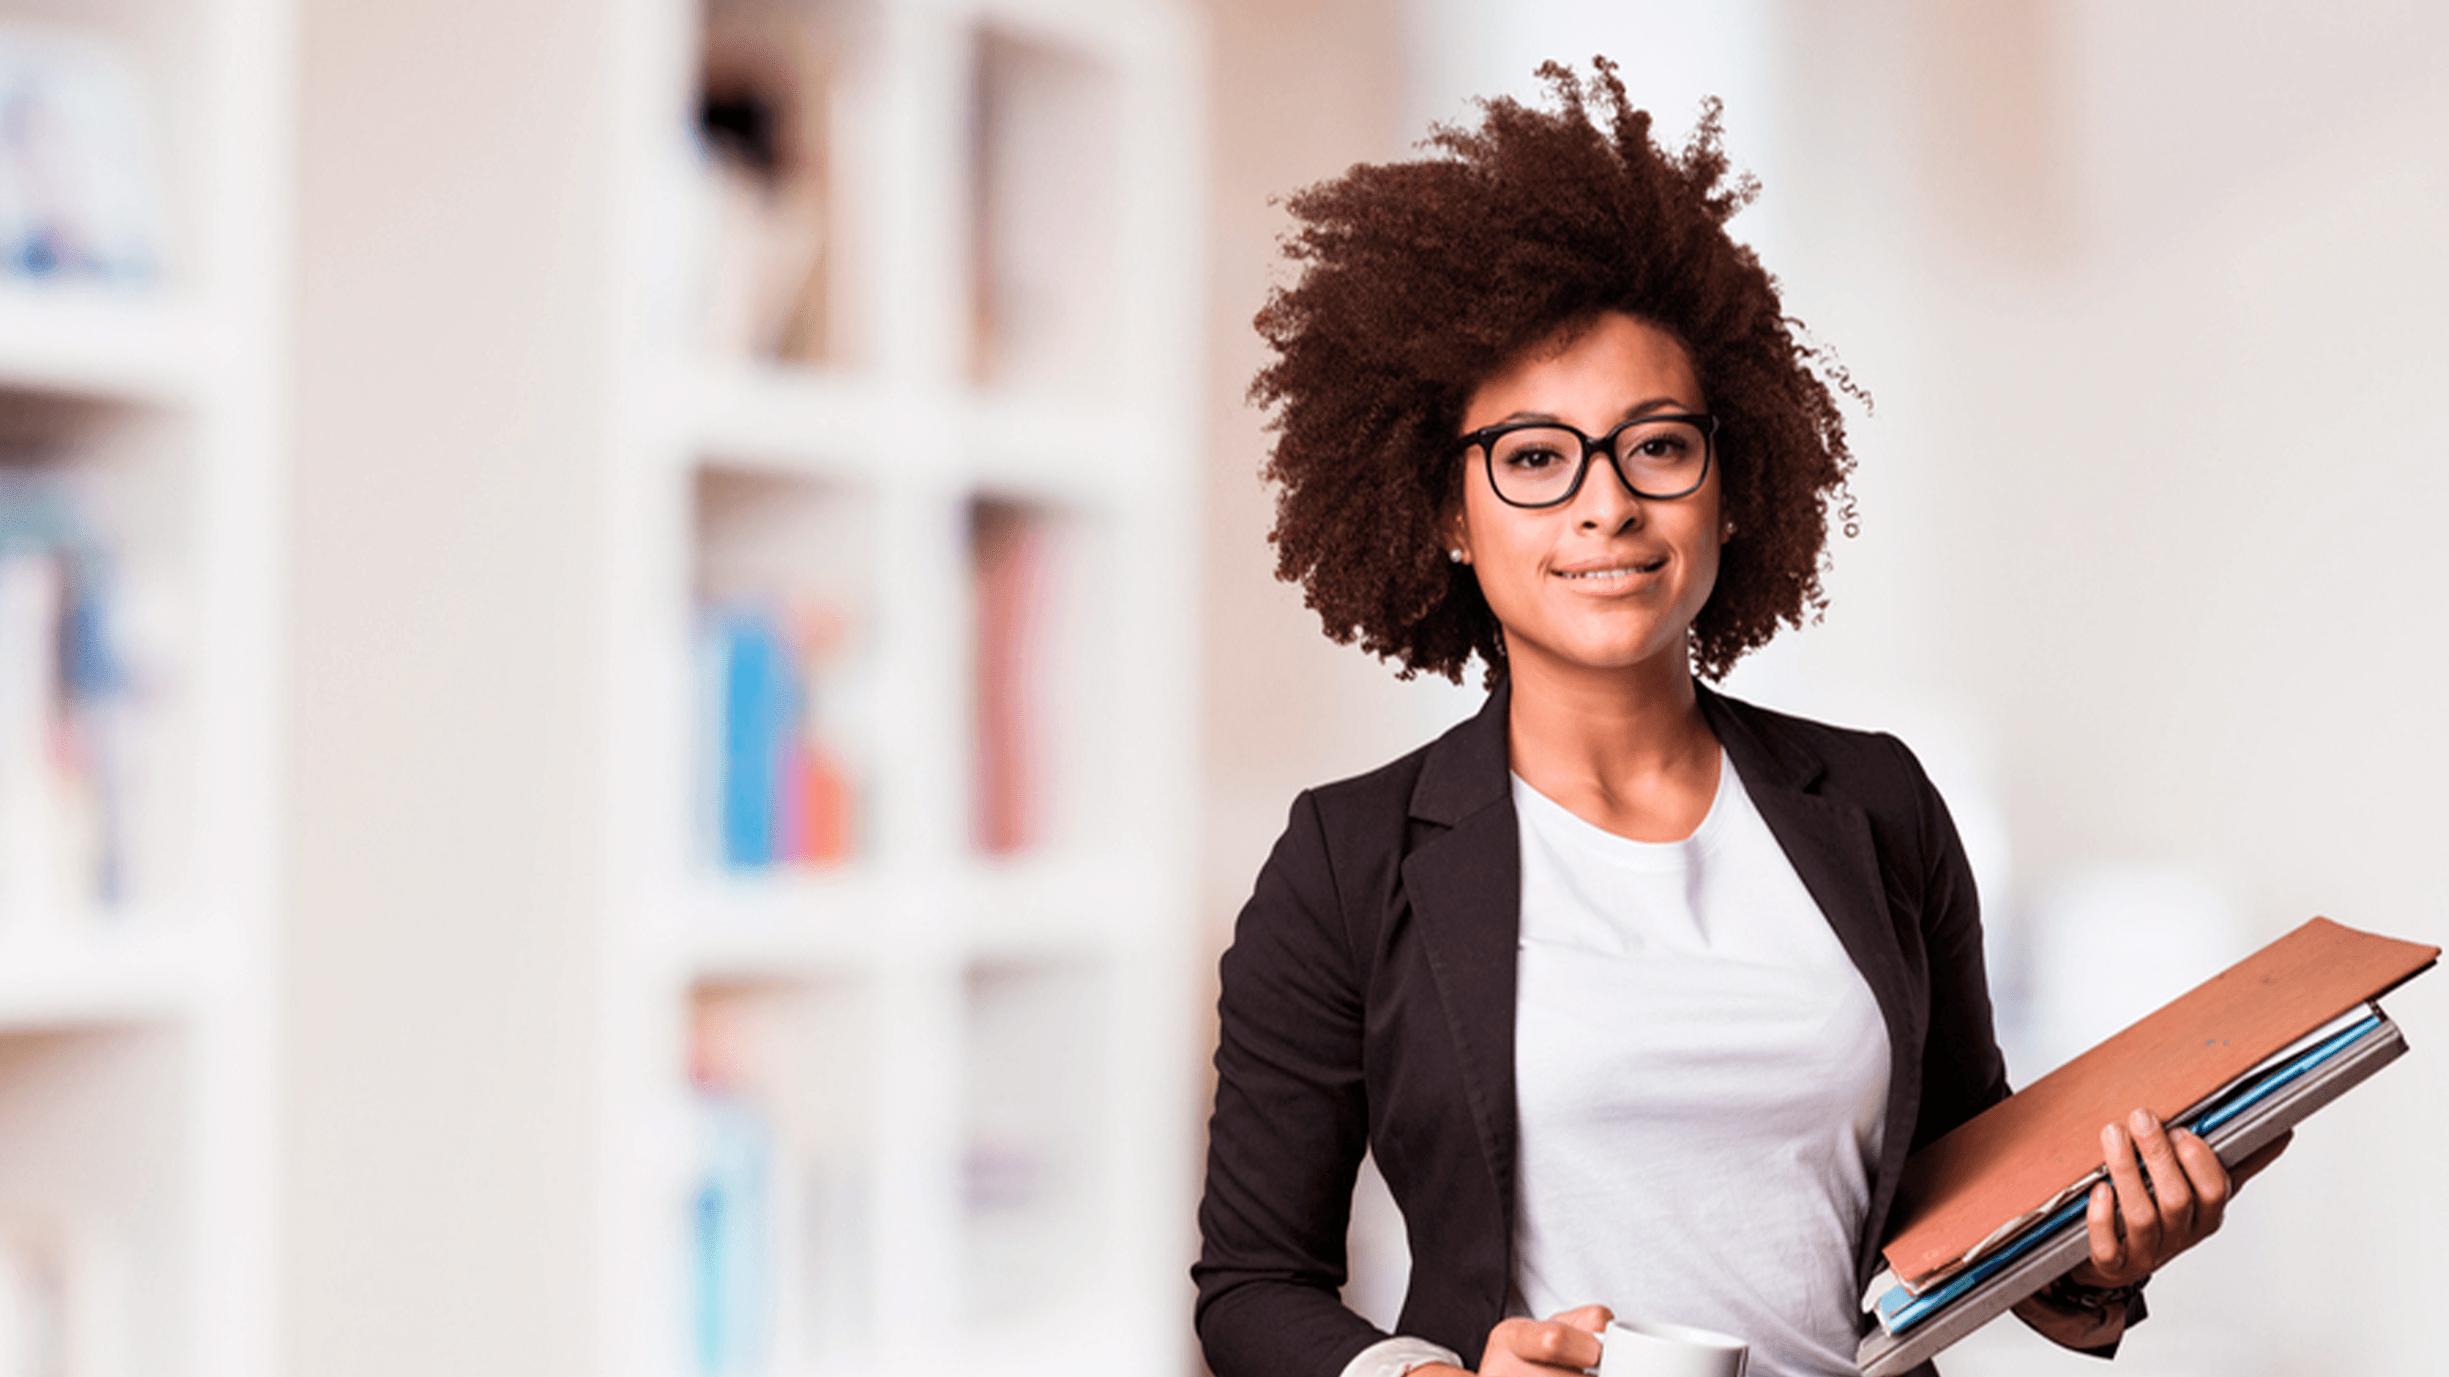 5 dicas para o enriquecimento da base de dados de grandes empresas